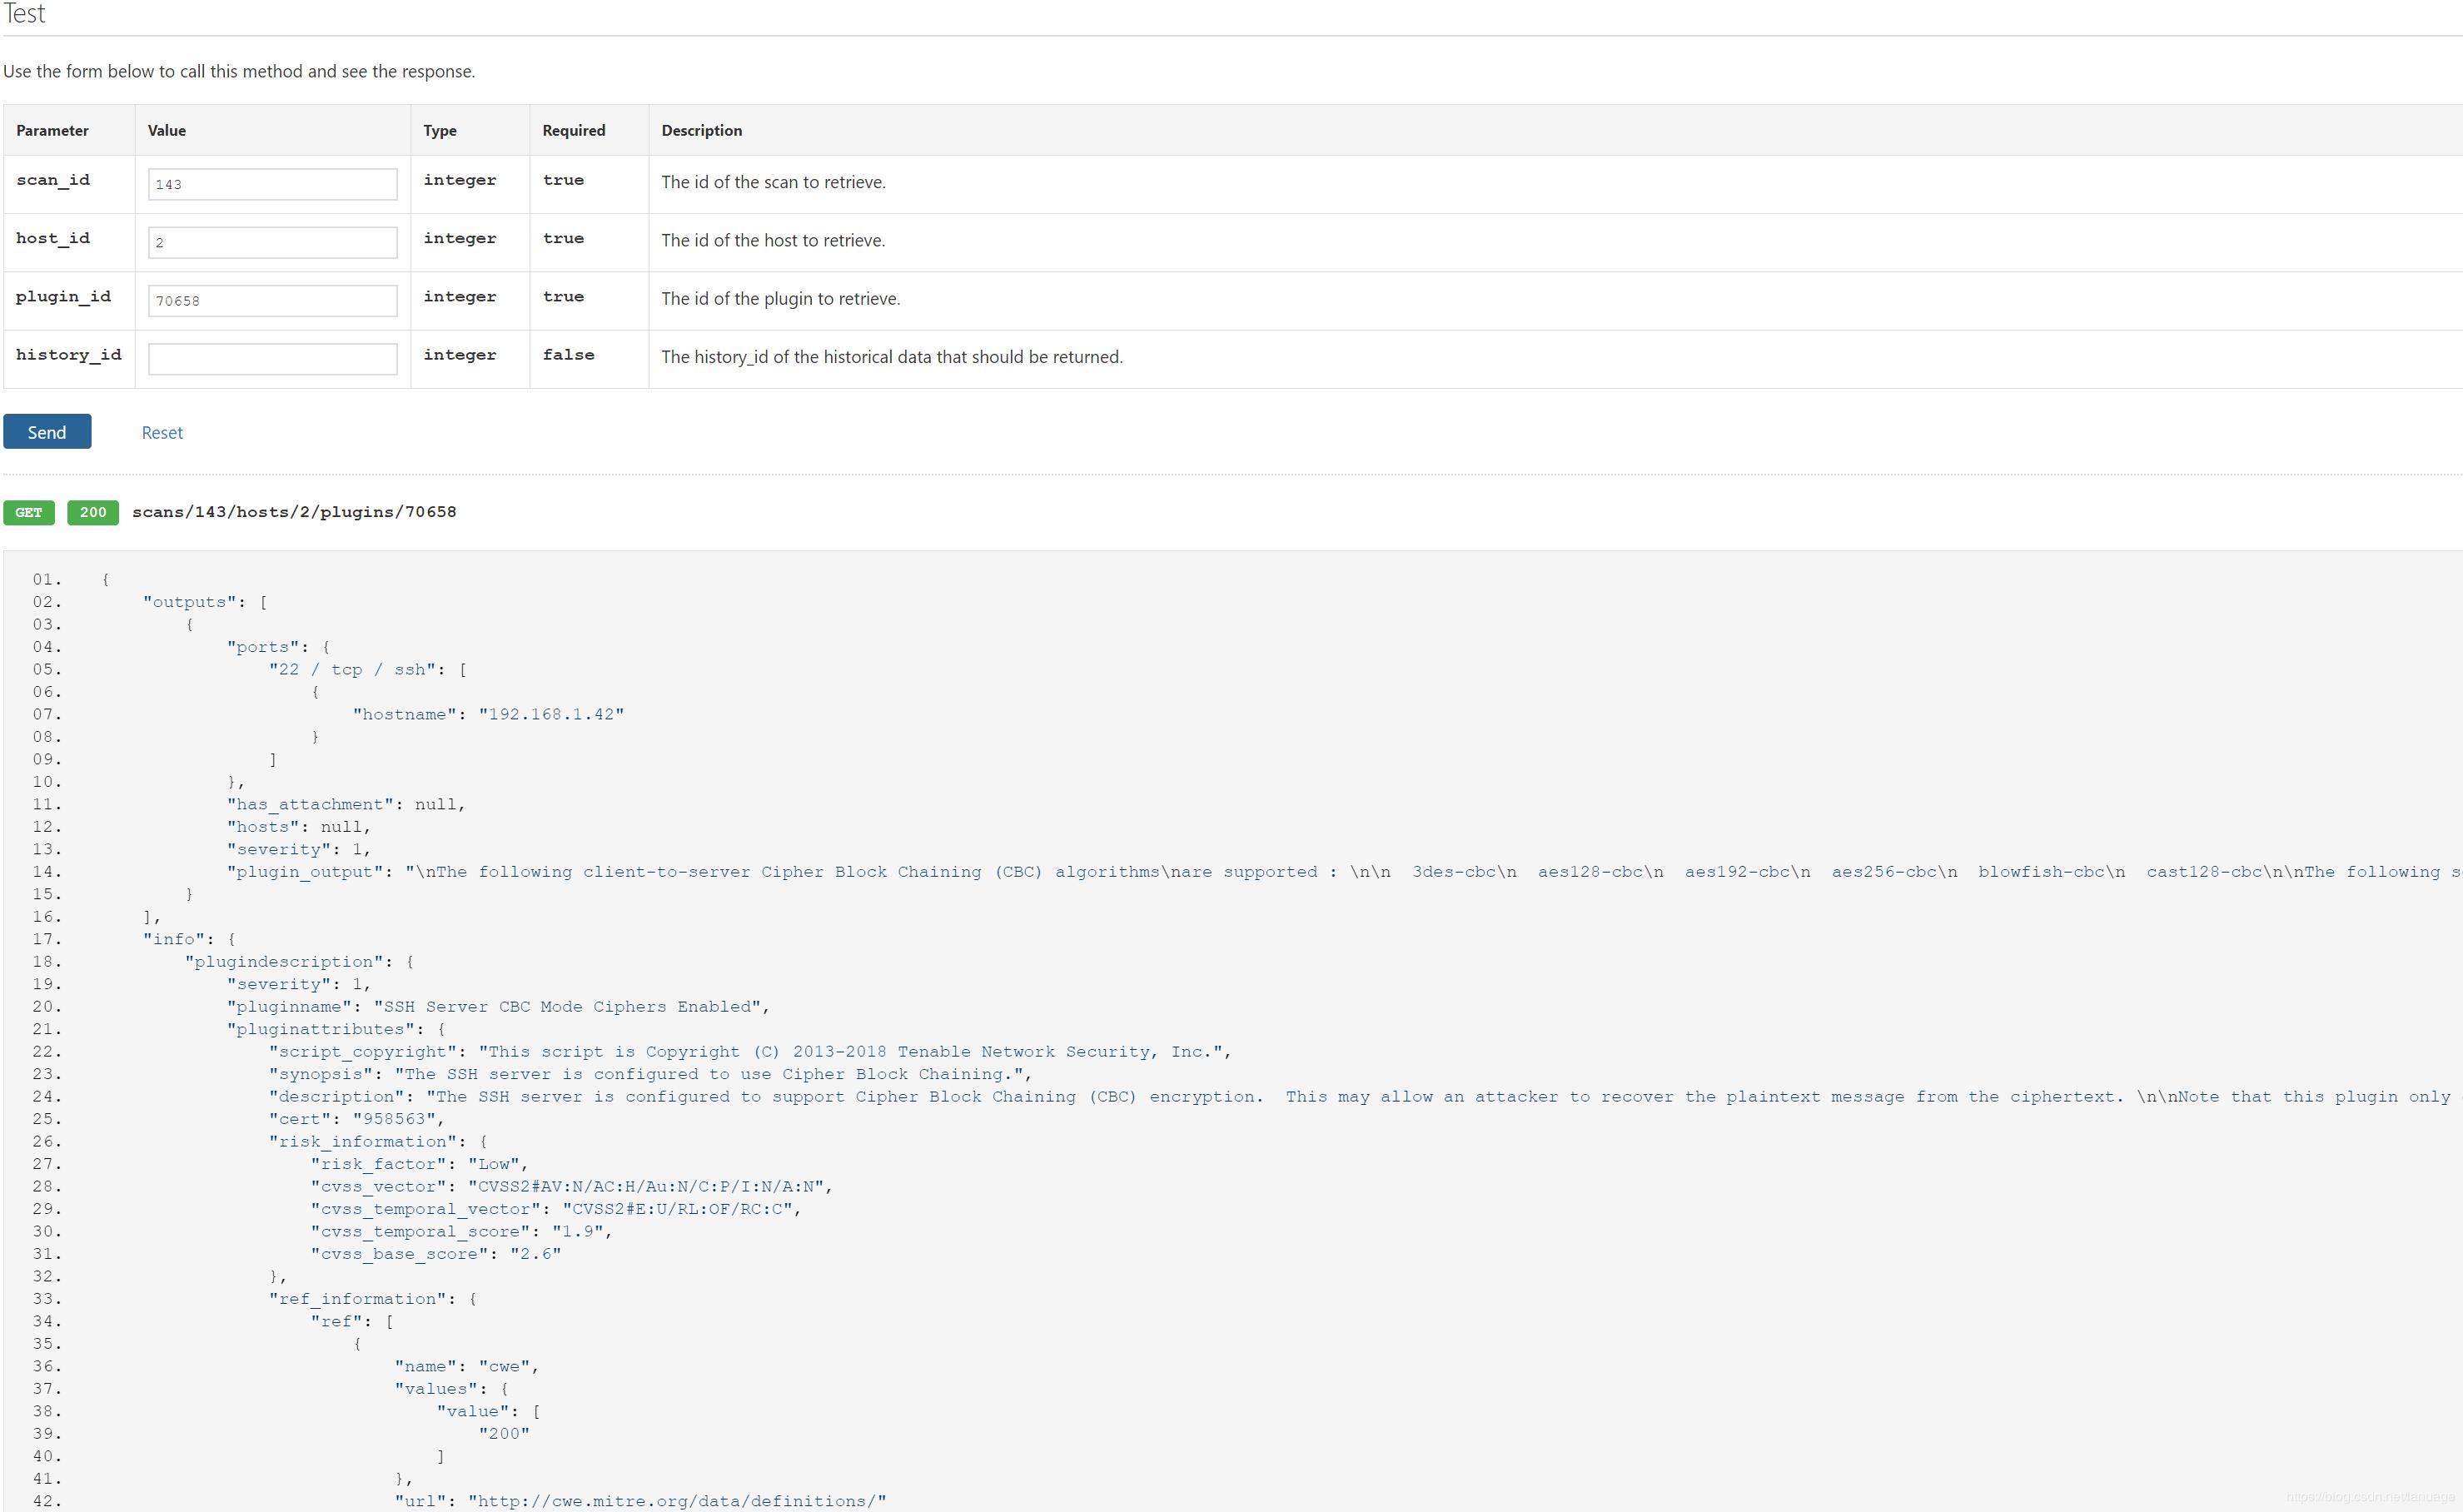 使用Python调用Nessus 接口实现自动化扫描